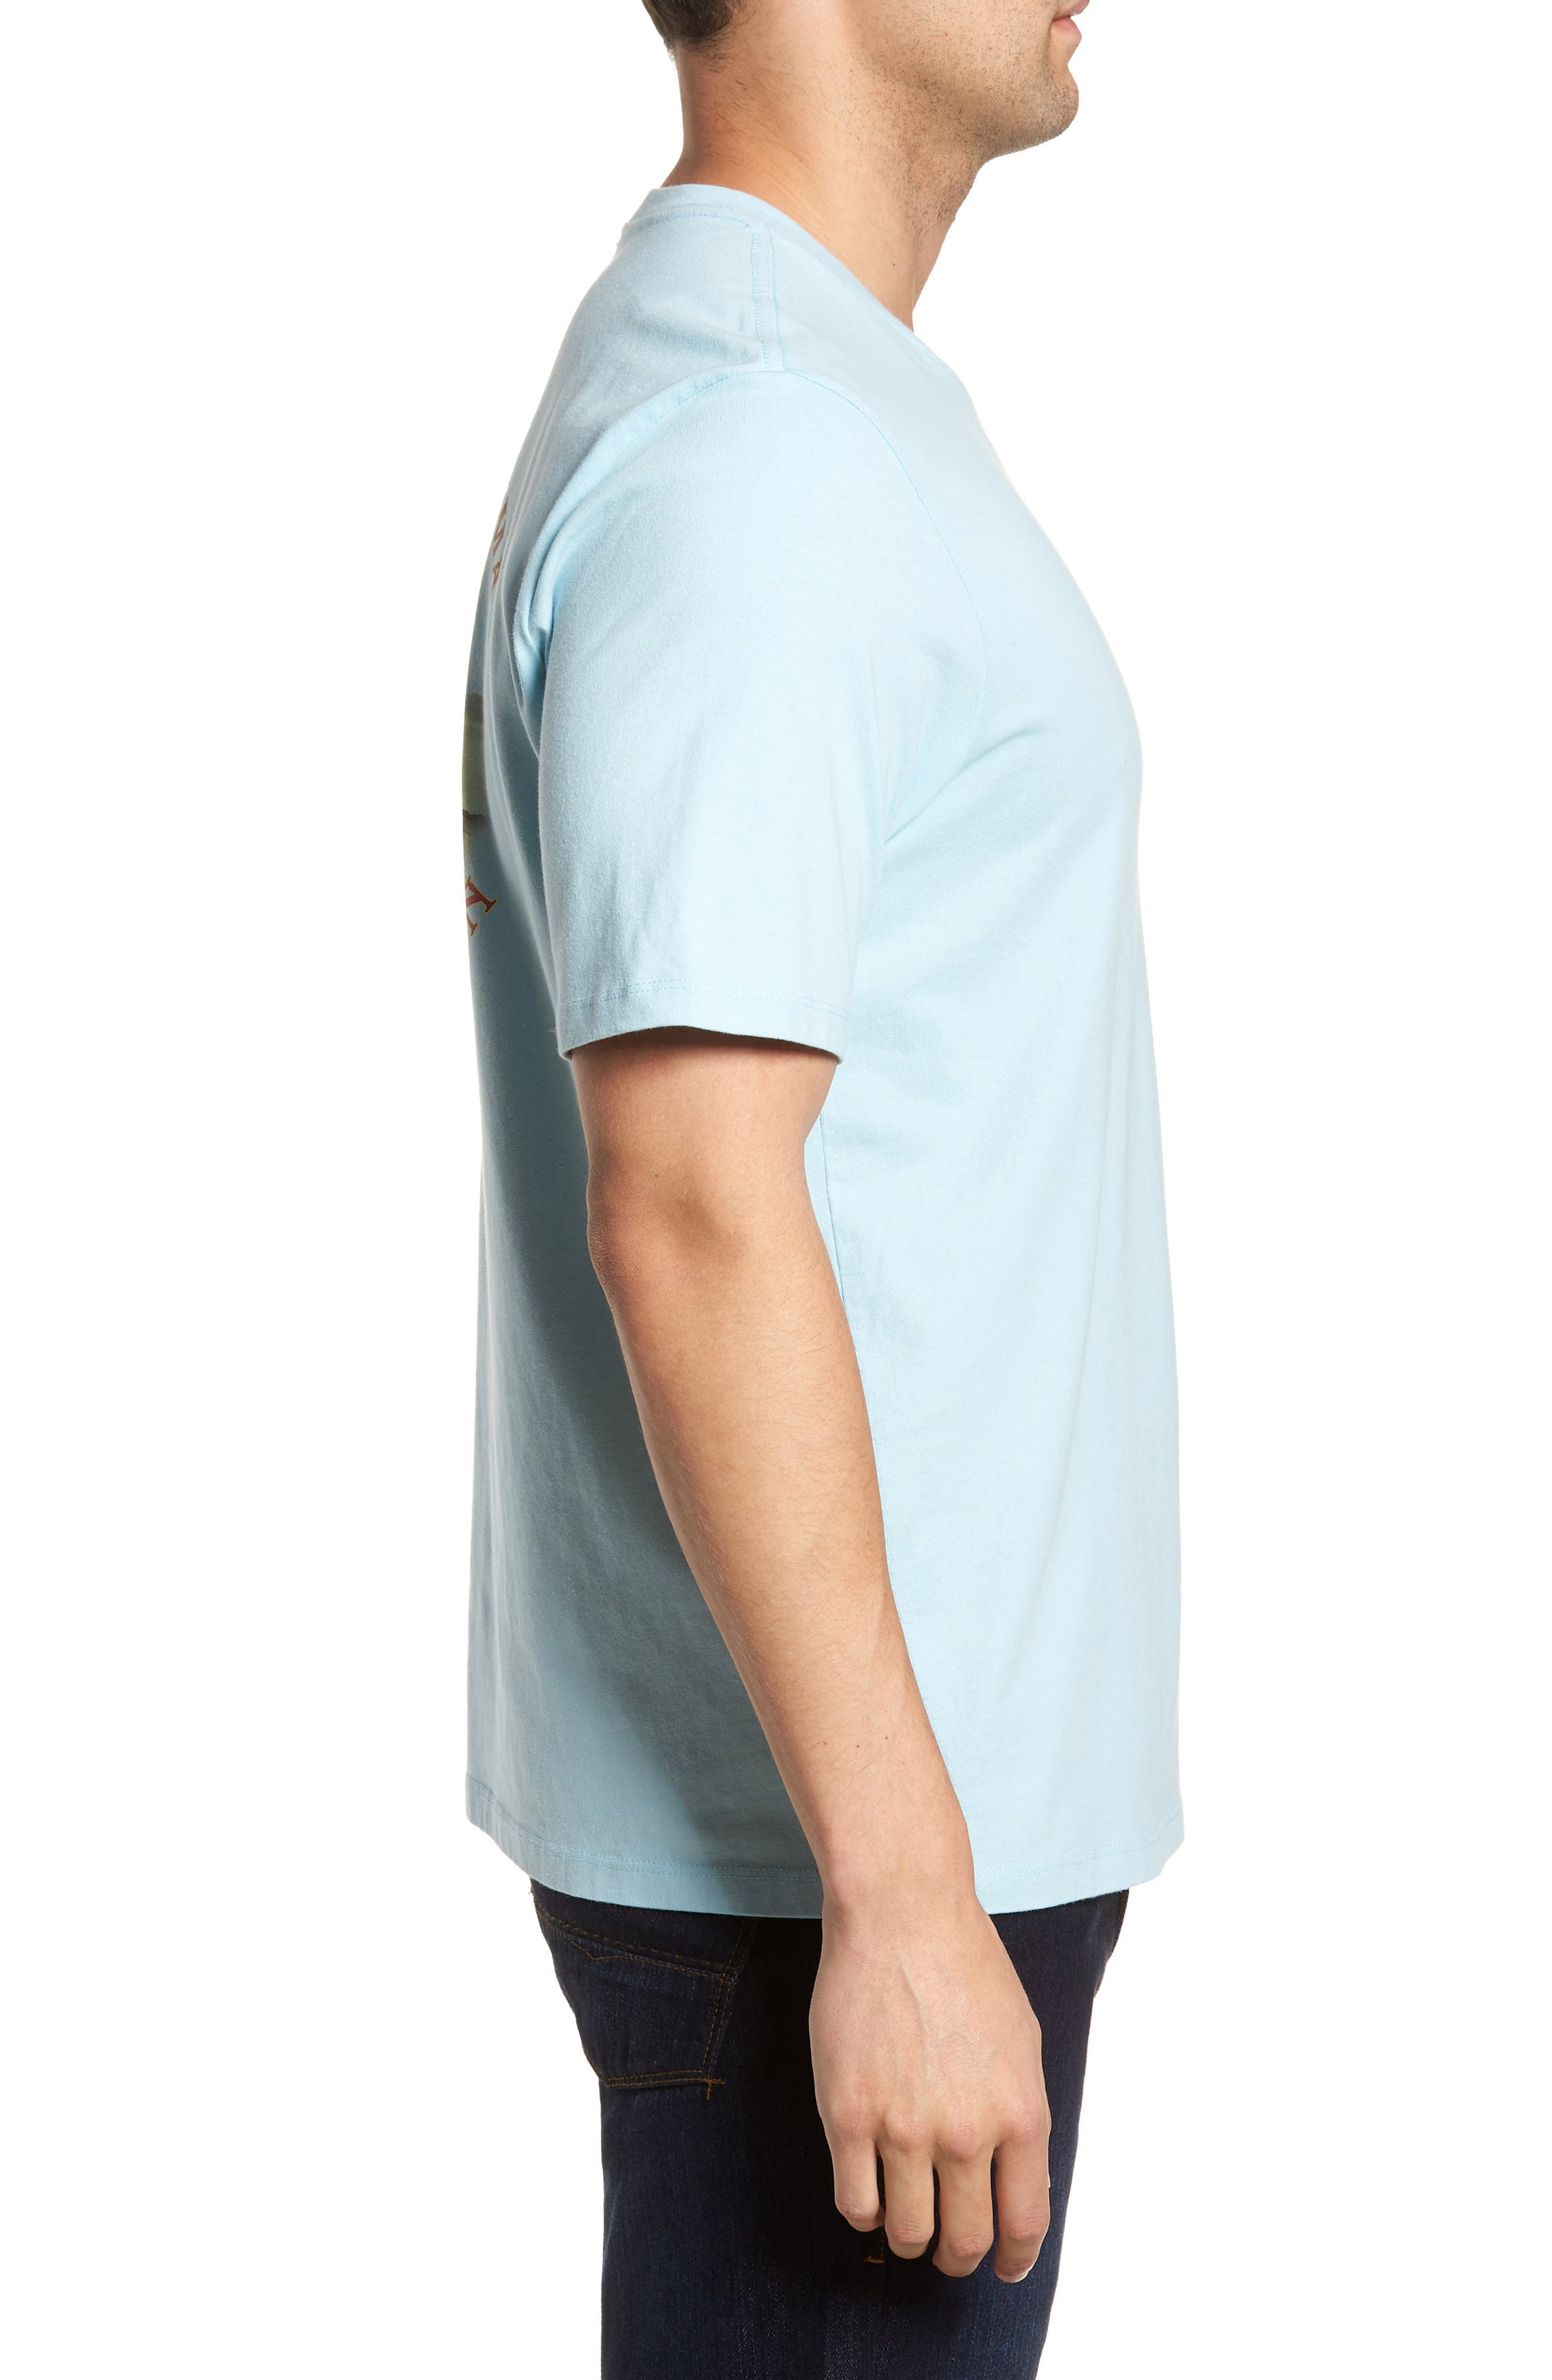 Zinspiration T-Shirt,                             Alternate thumbnail 3, color,                             100